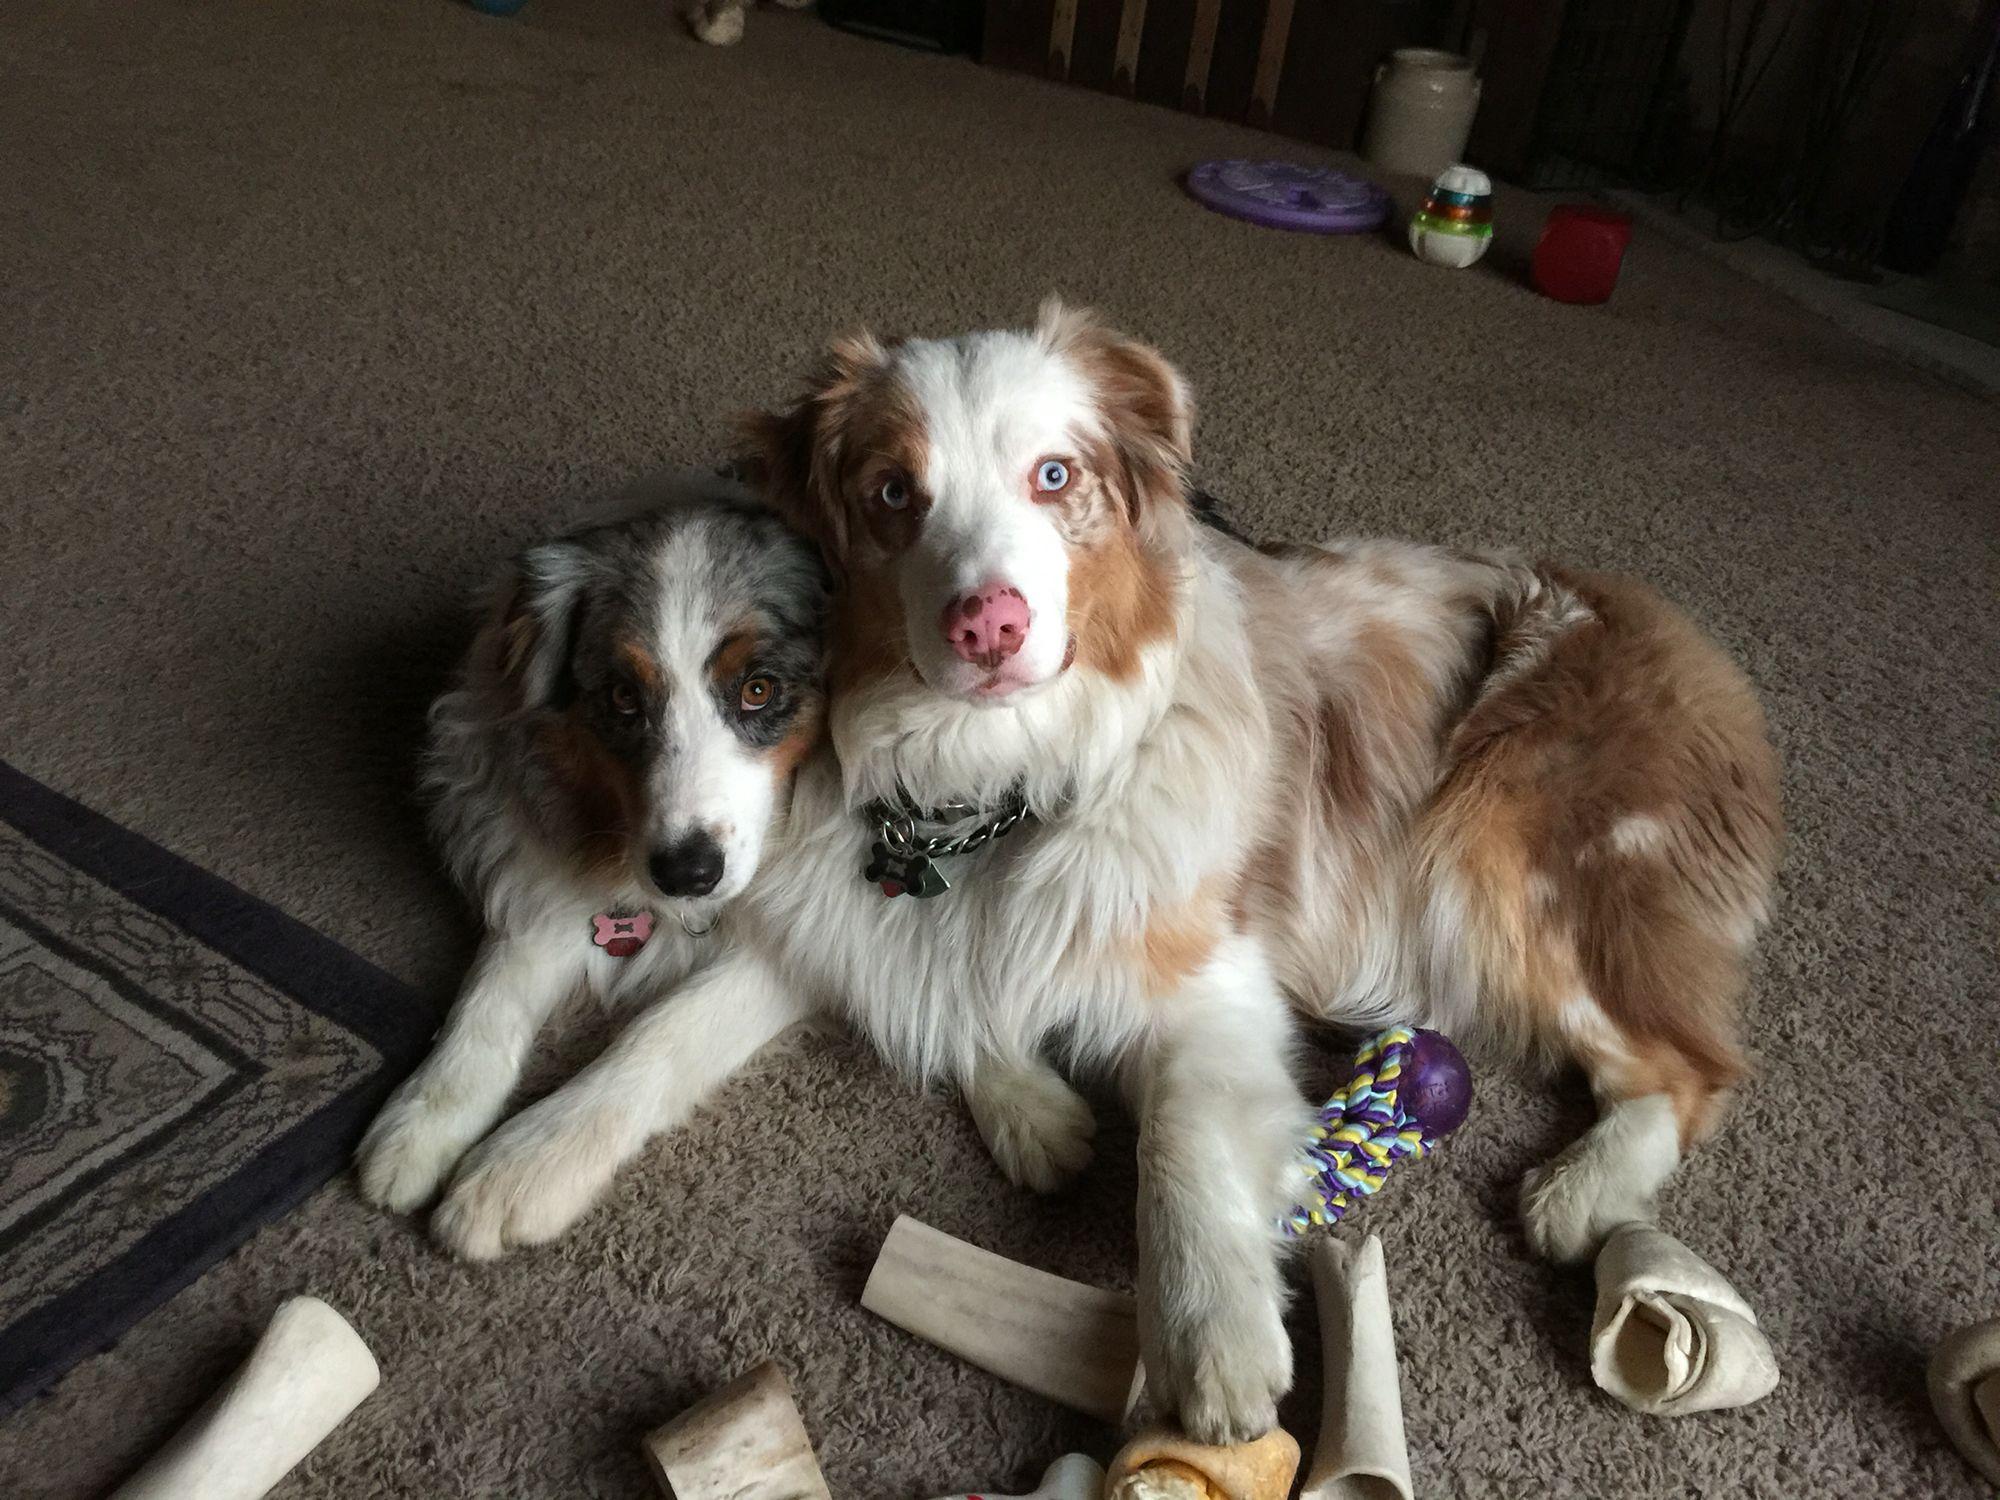 Blue Merle Skylar Rose And Red Merle Diego Step Bro And Sis Hunde Tiere Australien